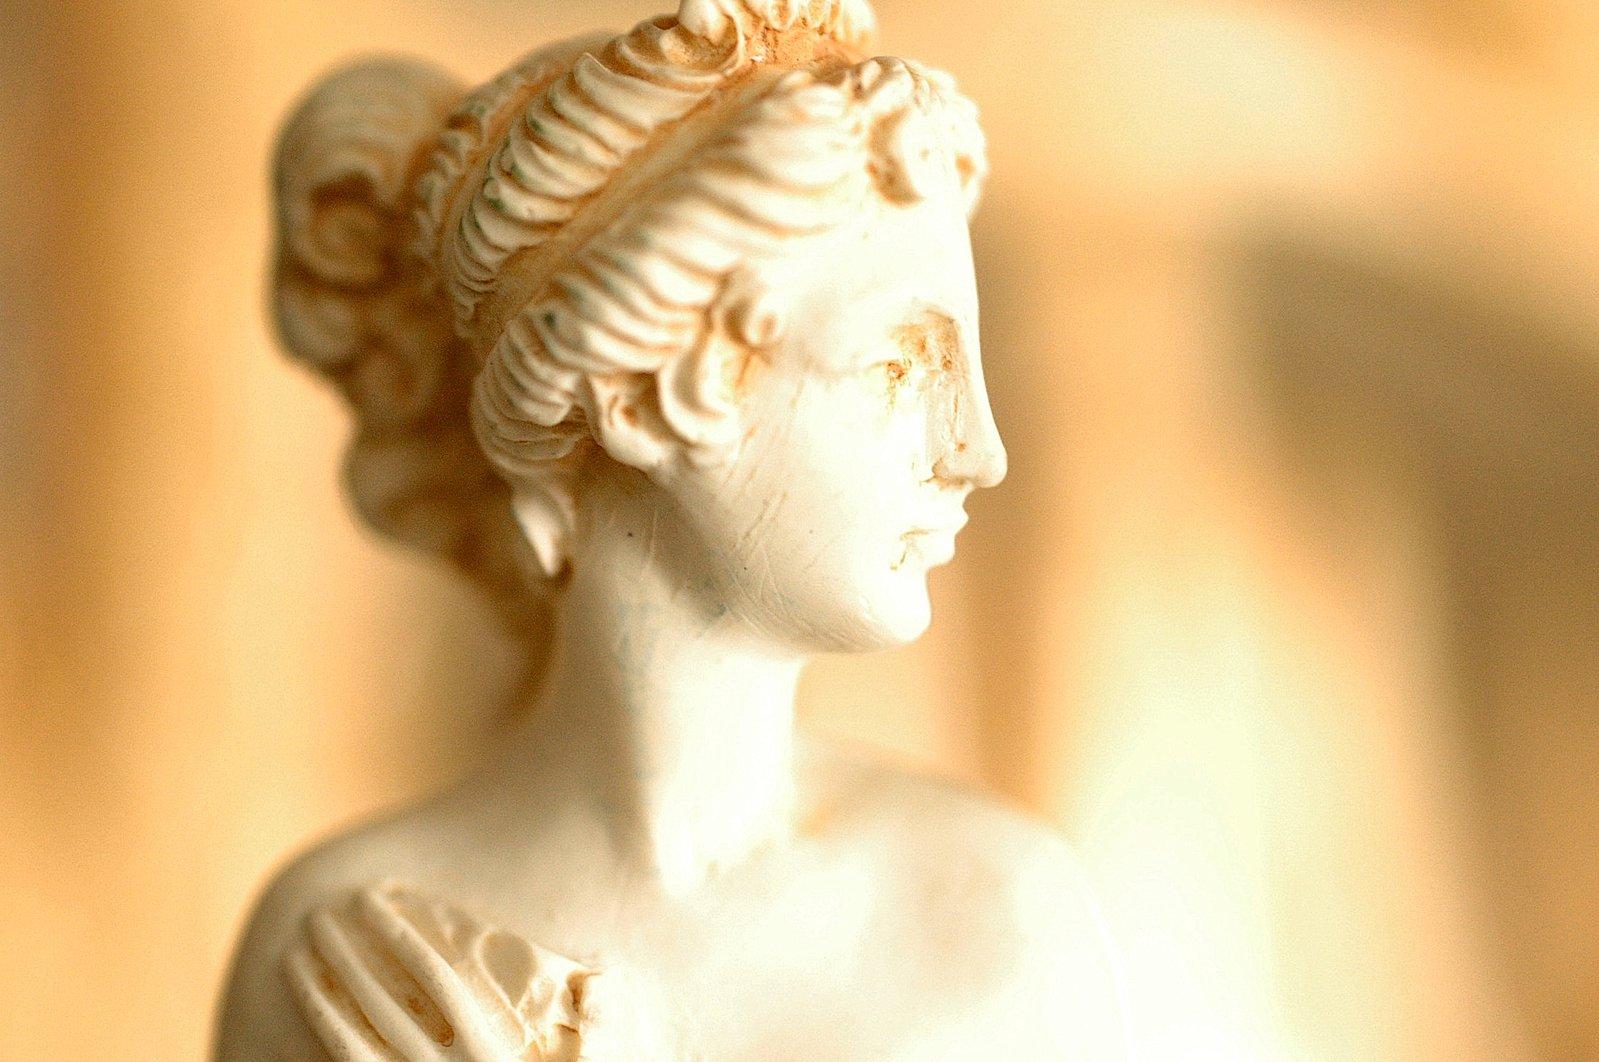 venus,love,beauty,greece